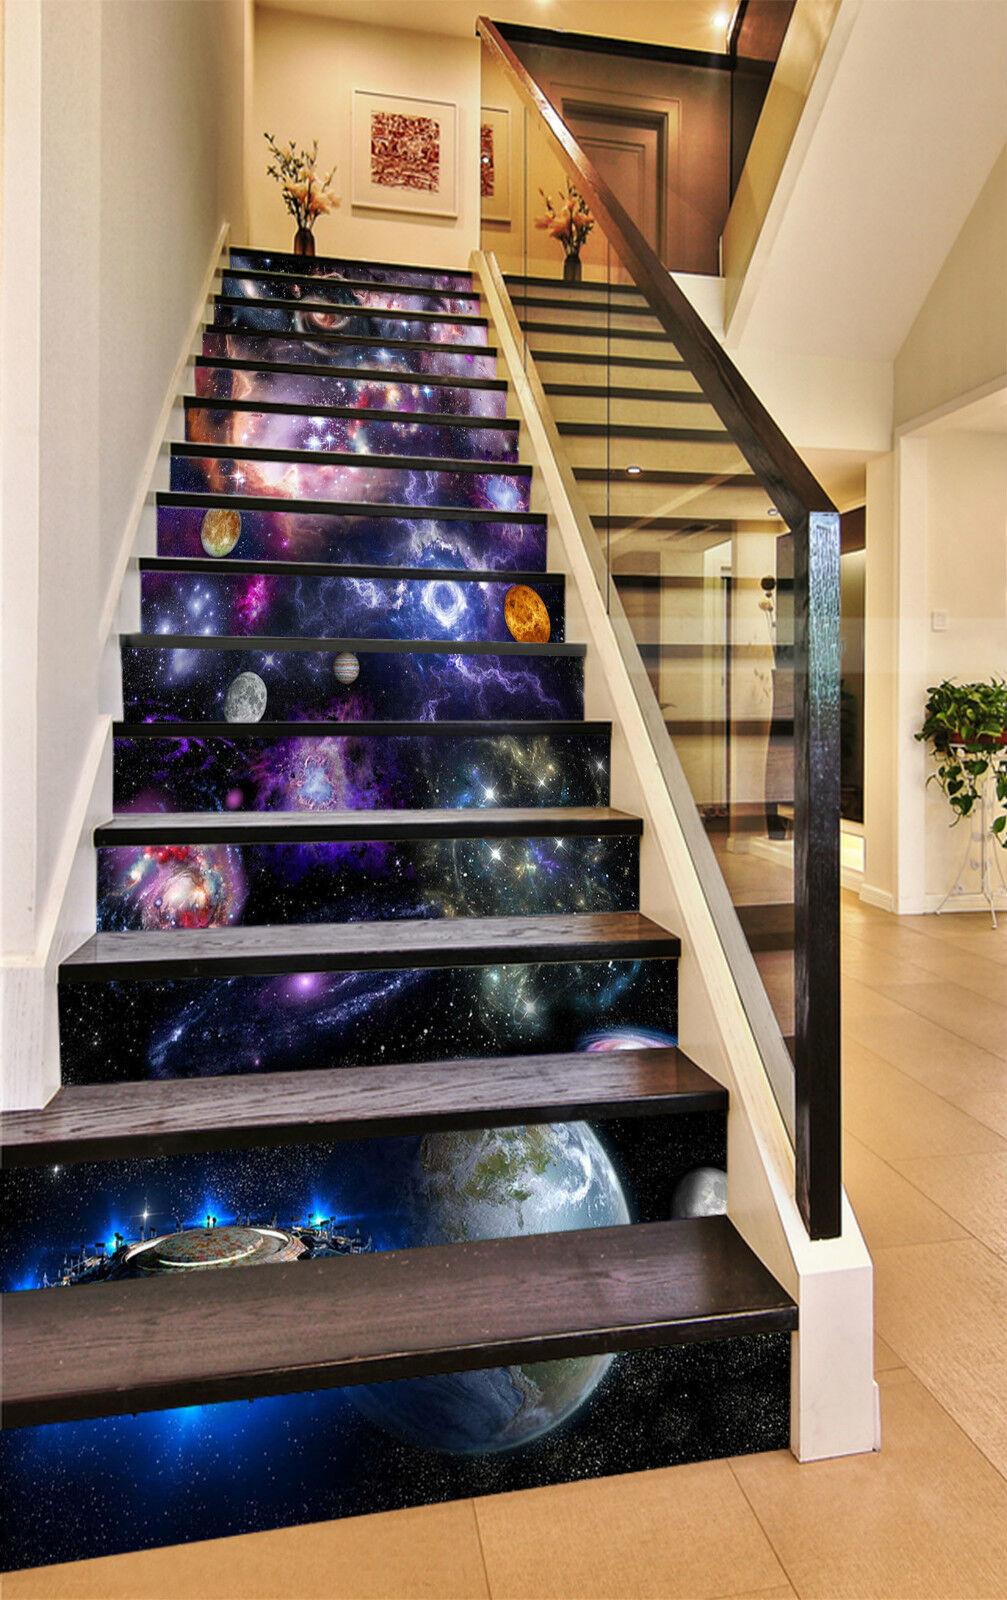 3D Raum Planeten 20 Stair Risers Dekoration Fototapete Vinyl Vinyl Vinyl Aufkleber Tapete DE 526c50